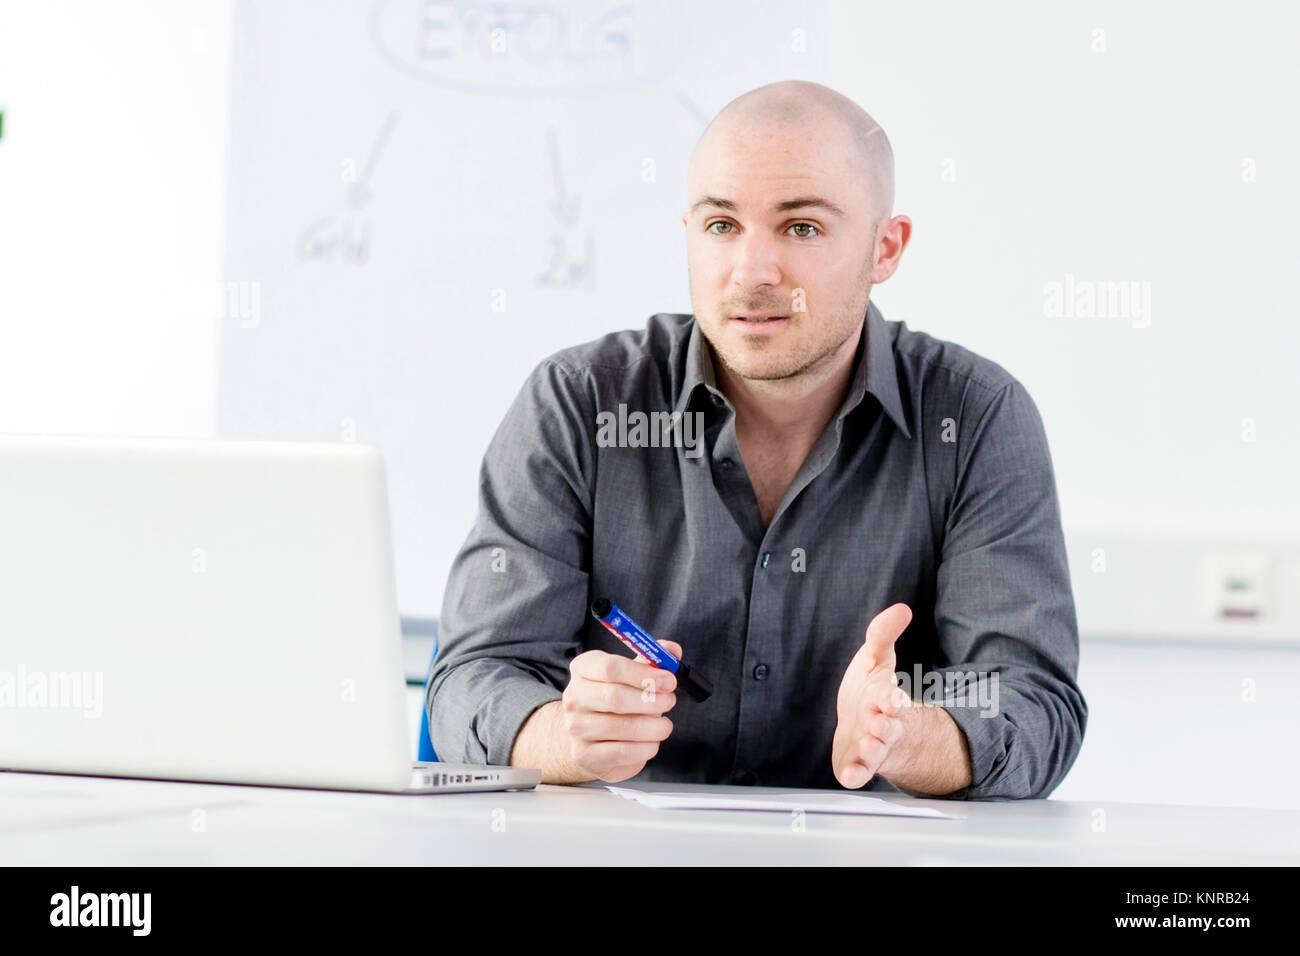 Mann im Buero - man in office - Stock Image